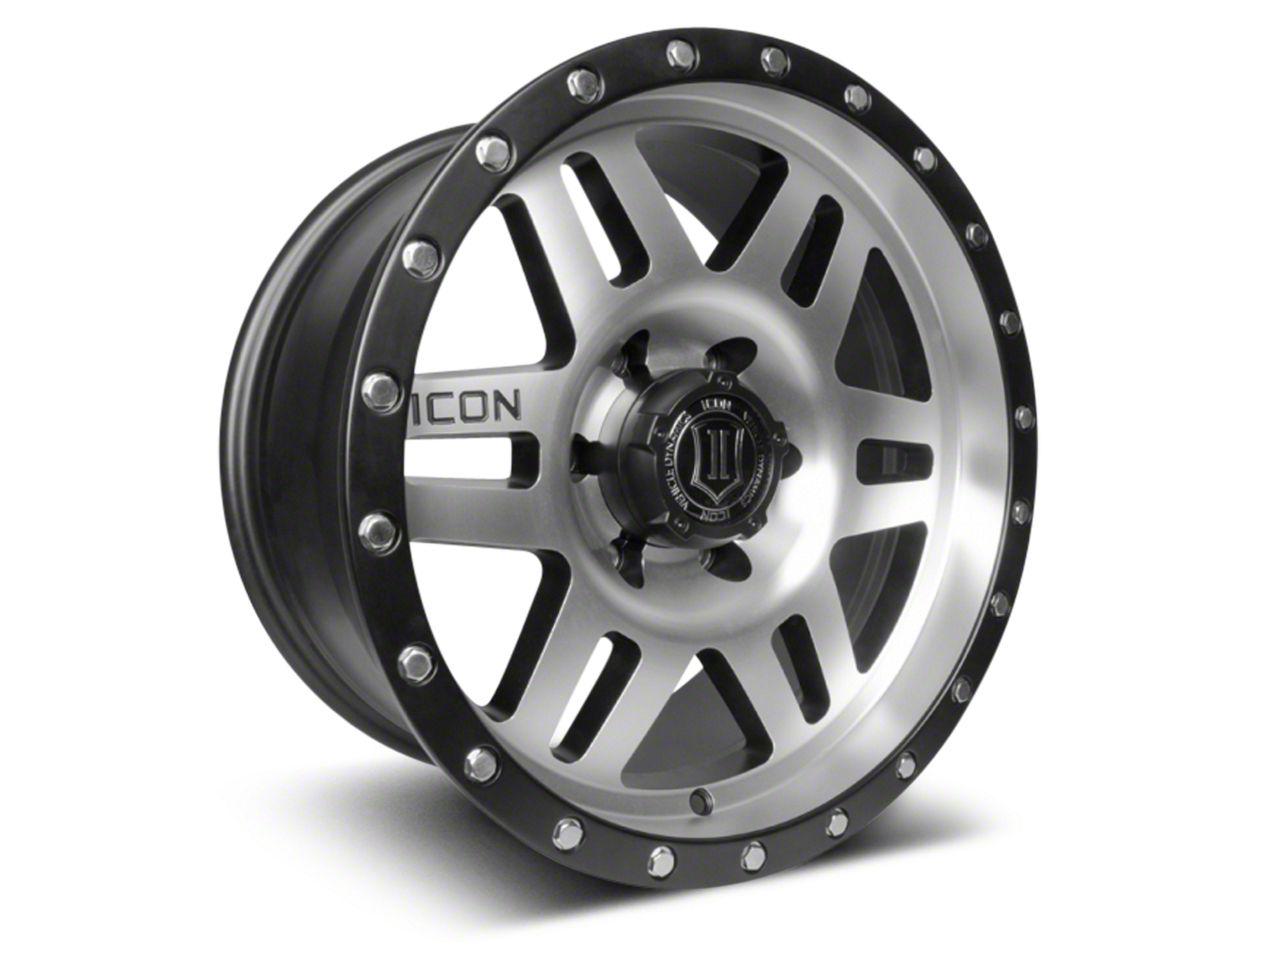 ICON Vehicle Dynamics Six Speed Satin Black Machined 6-Lug Wheel - 17x8.5 (04-19 F-150)